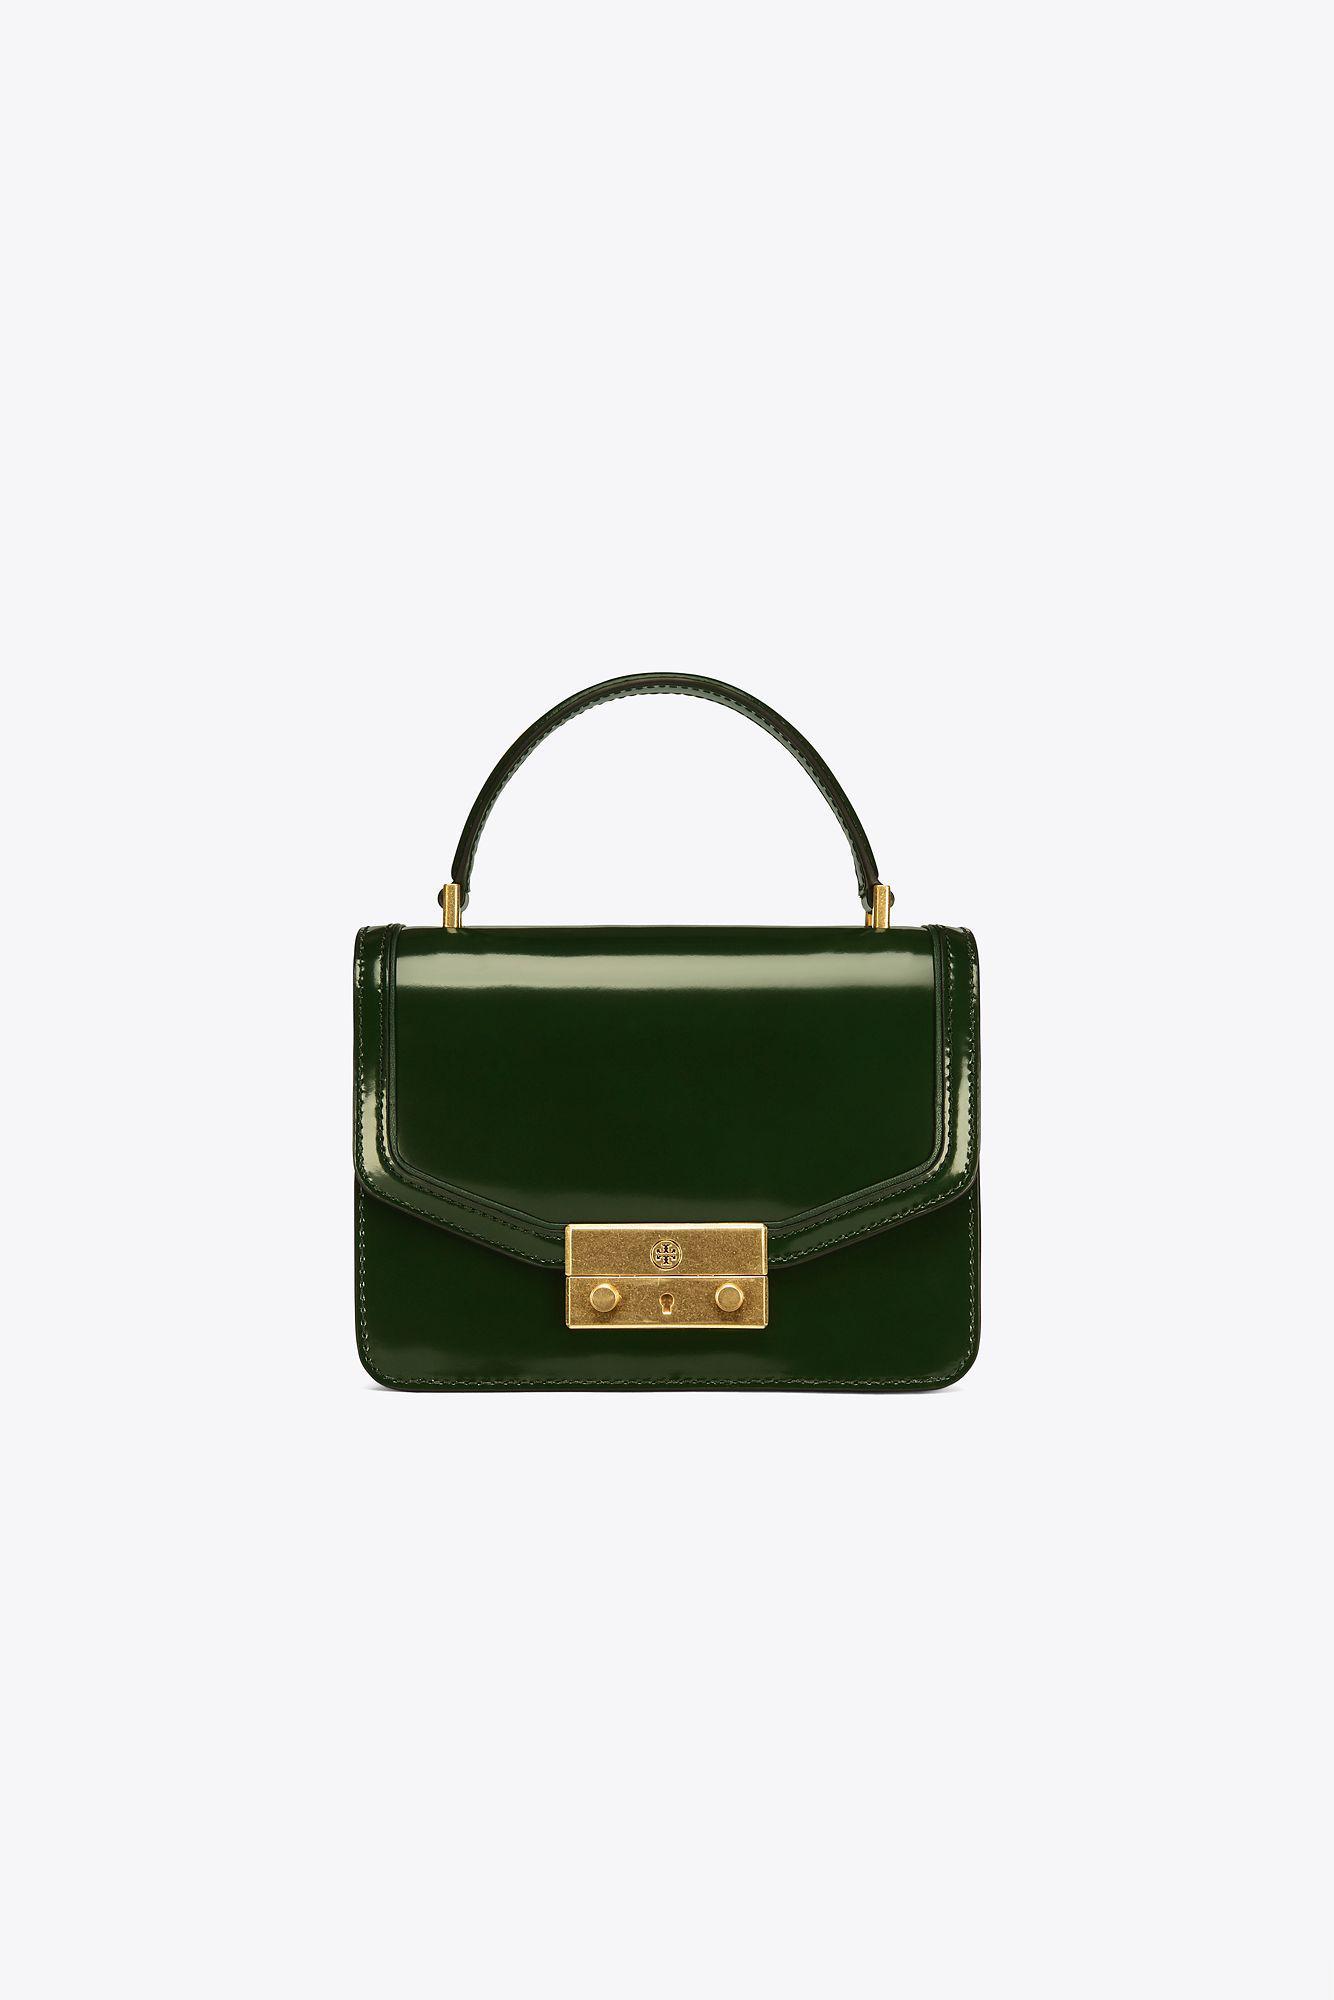 db0d1589ec61 Lyst - Tory Burch Juliette Mini Top-handle Satchel in Green